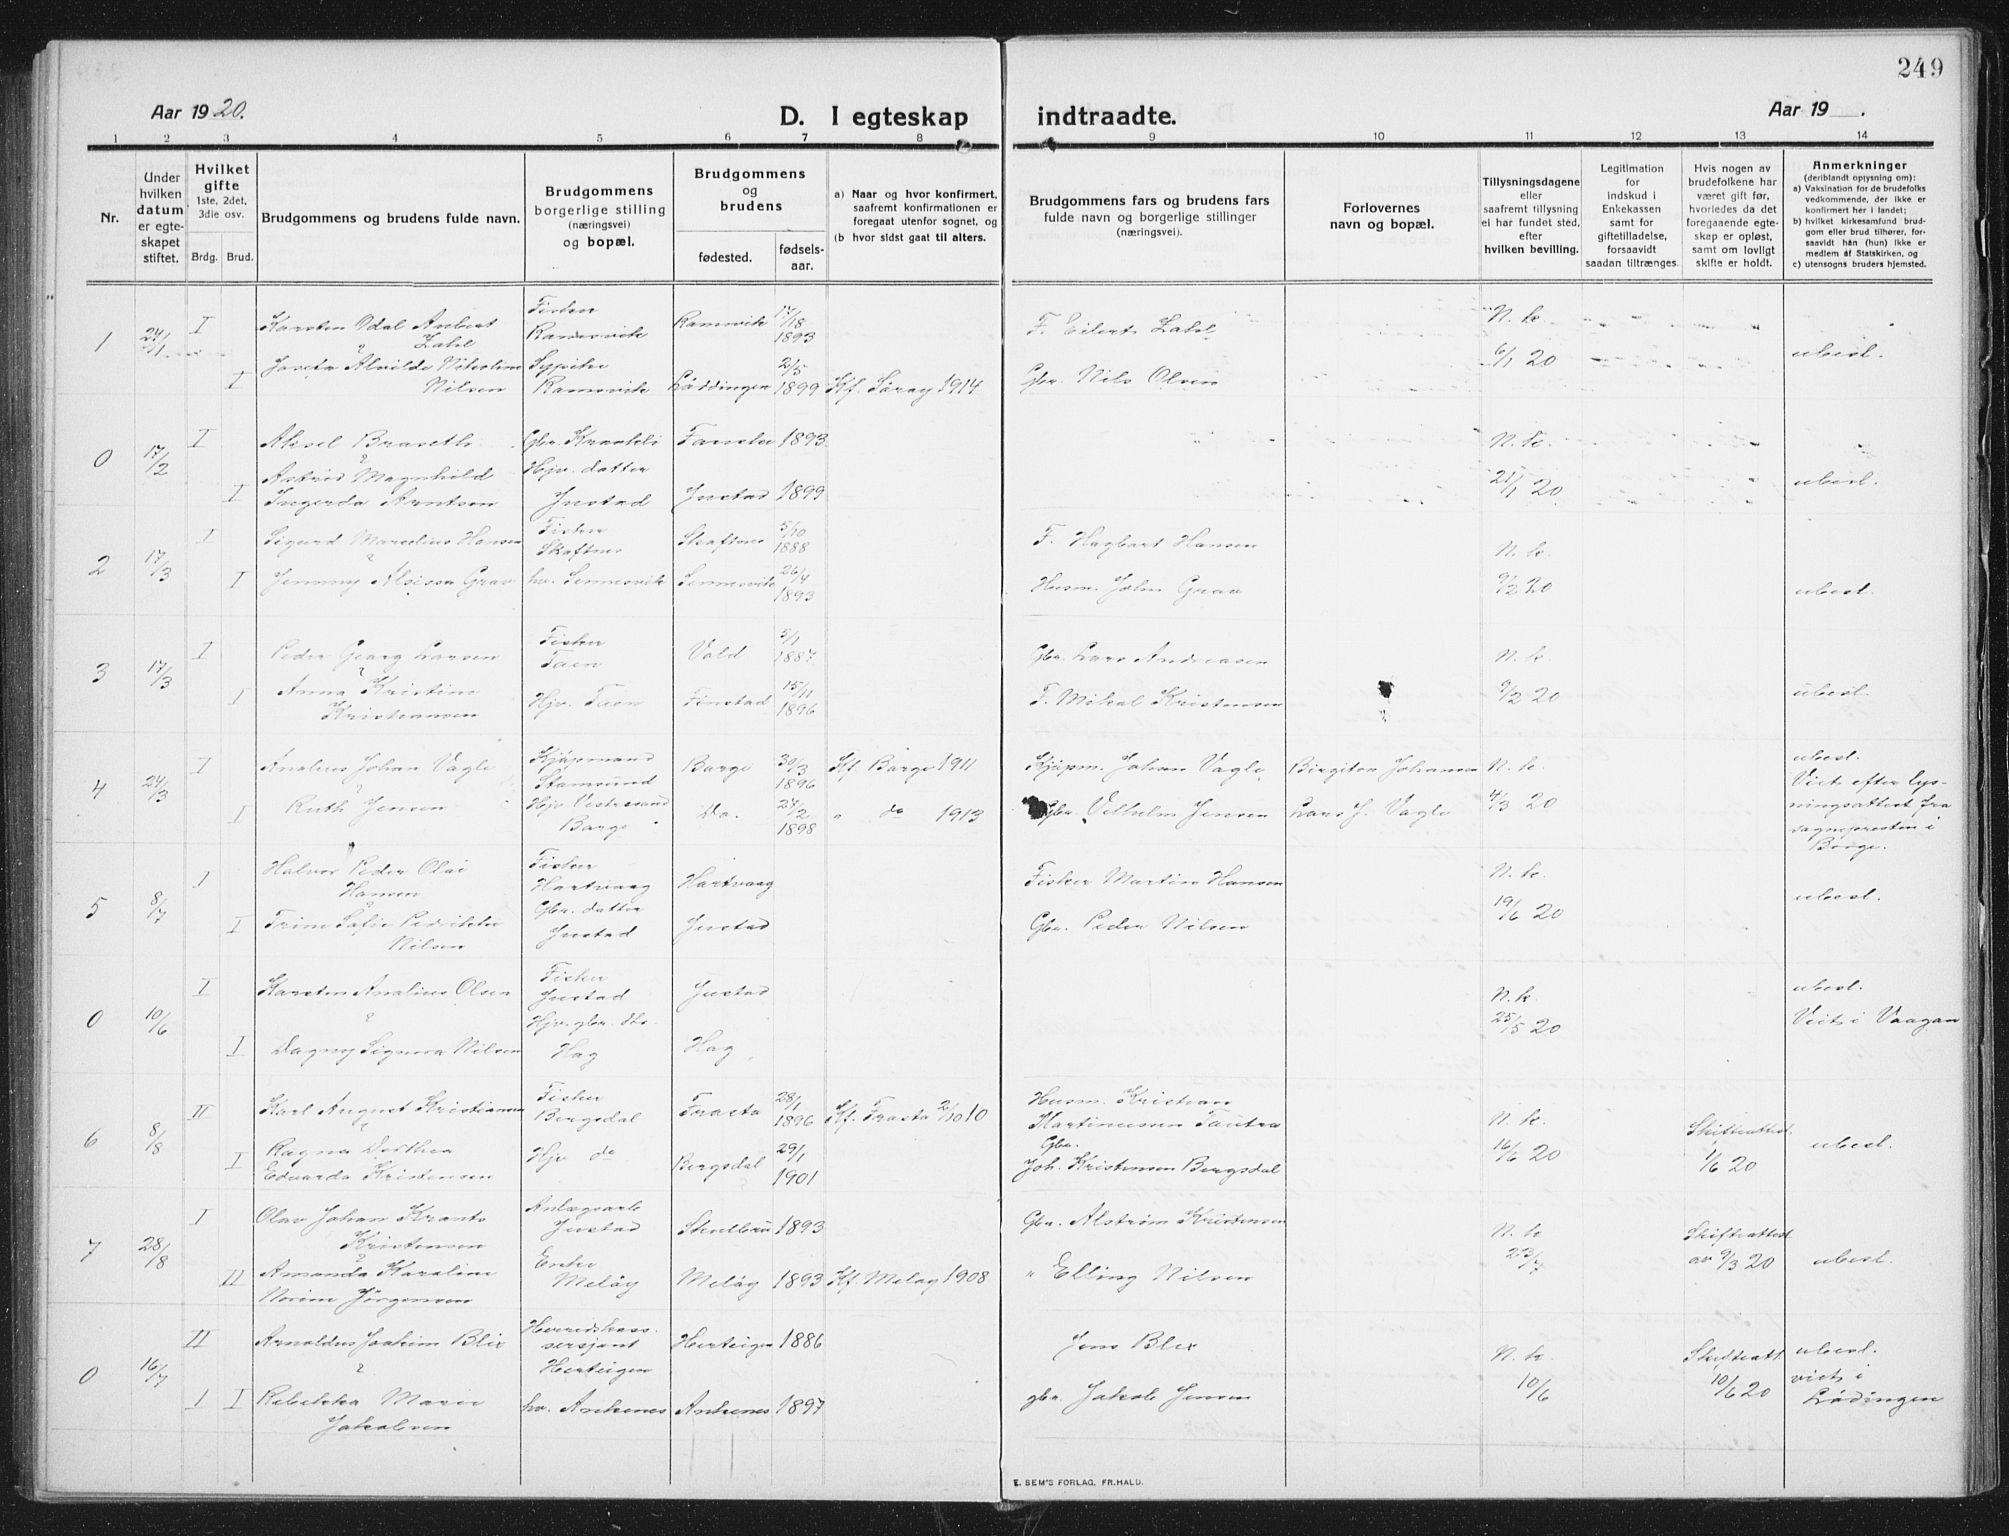 SAT, Ministerialprotokoller, klokkerbøker og fødselsregistre - Nordland, 882/L1183: Klokkerbok nr. 882C01, 1911-1938, s. 249